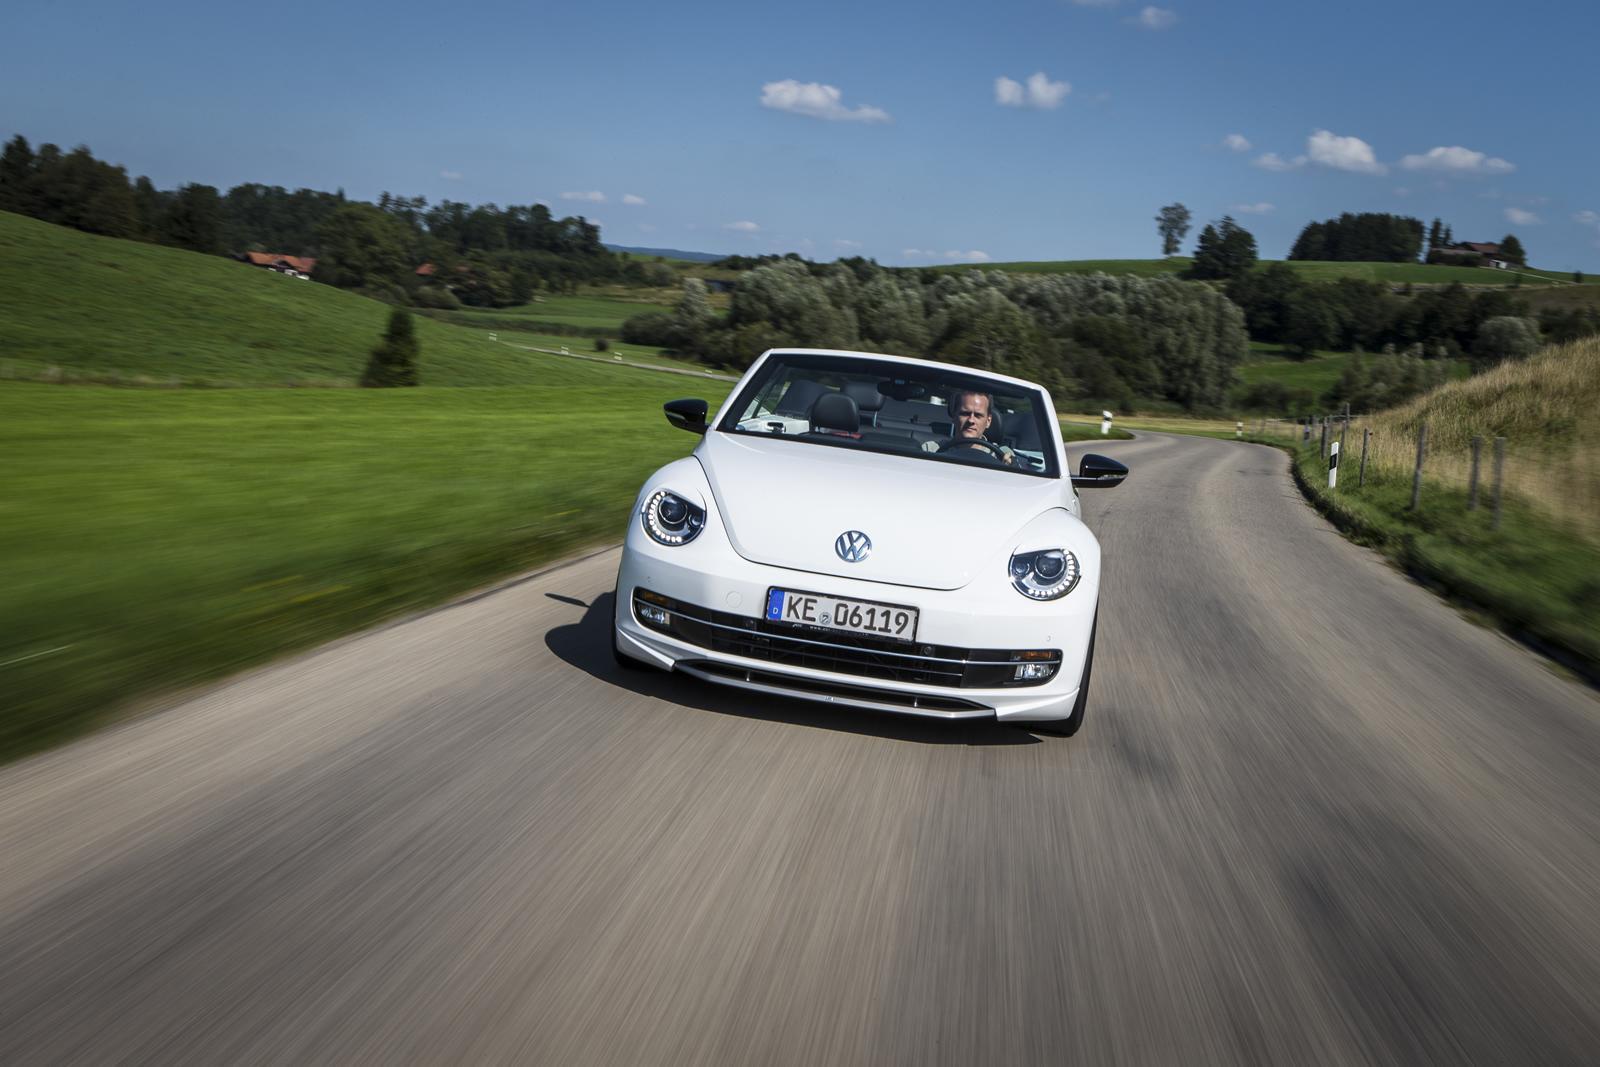 VW_Beetle_Cabrio_Abt_tuning